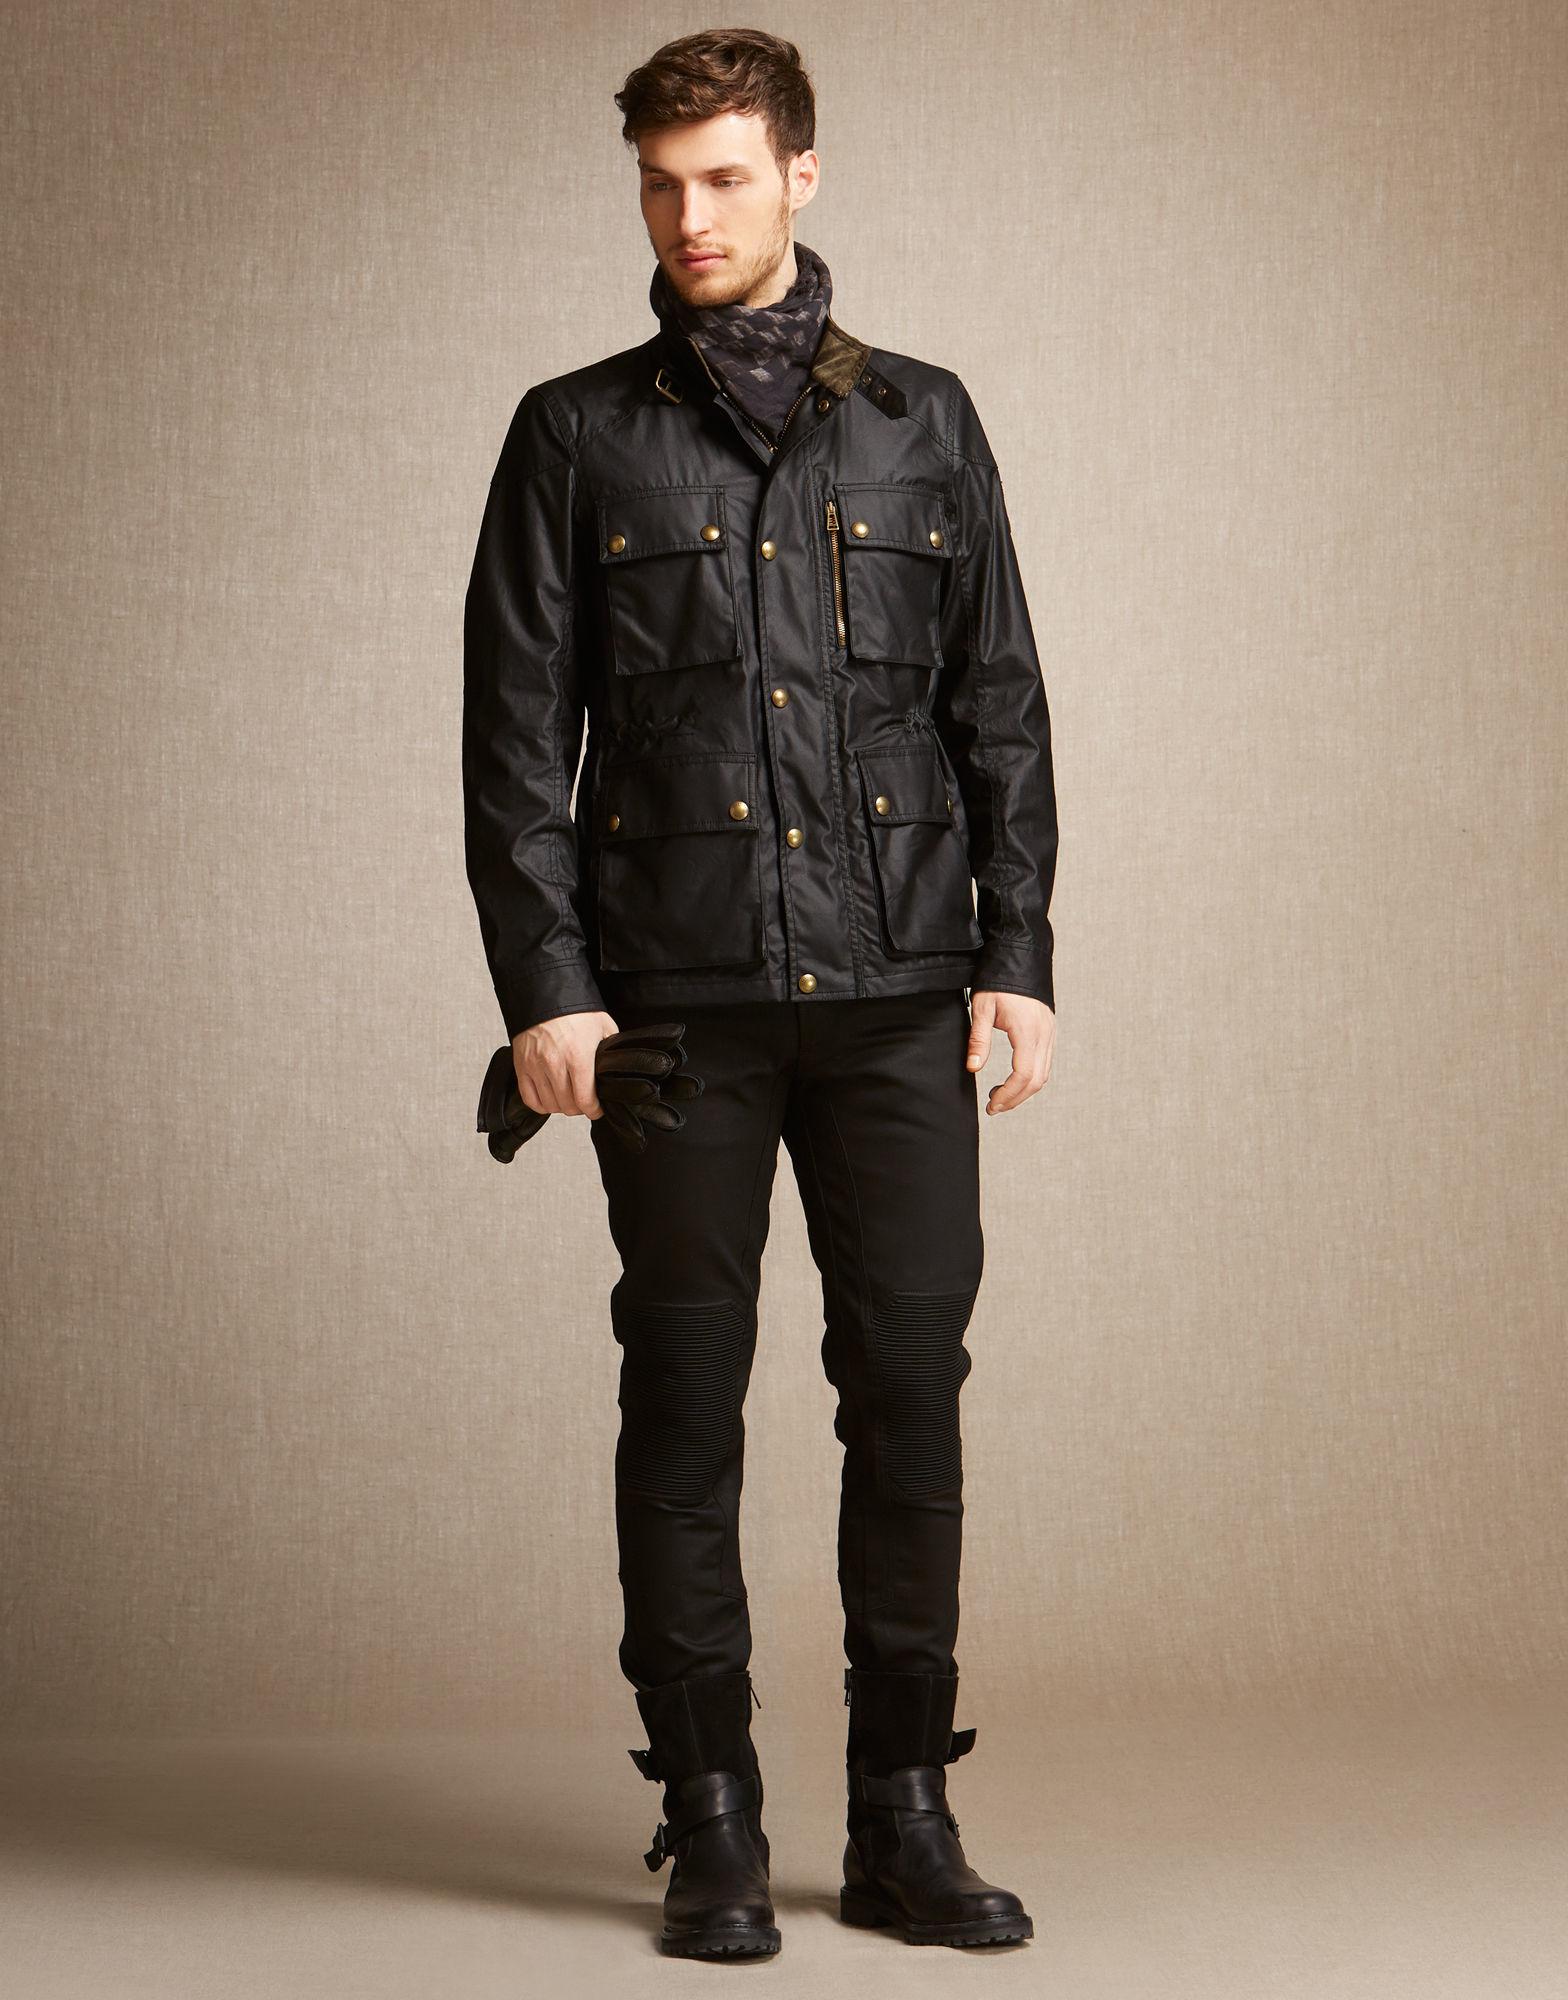 Belstaff Trialmaster Jacket In Black Signature 6oz Waxed